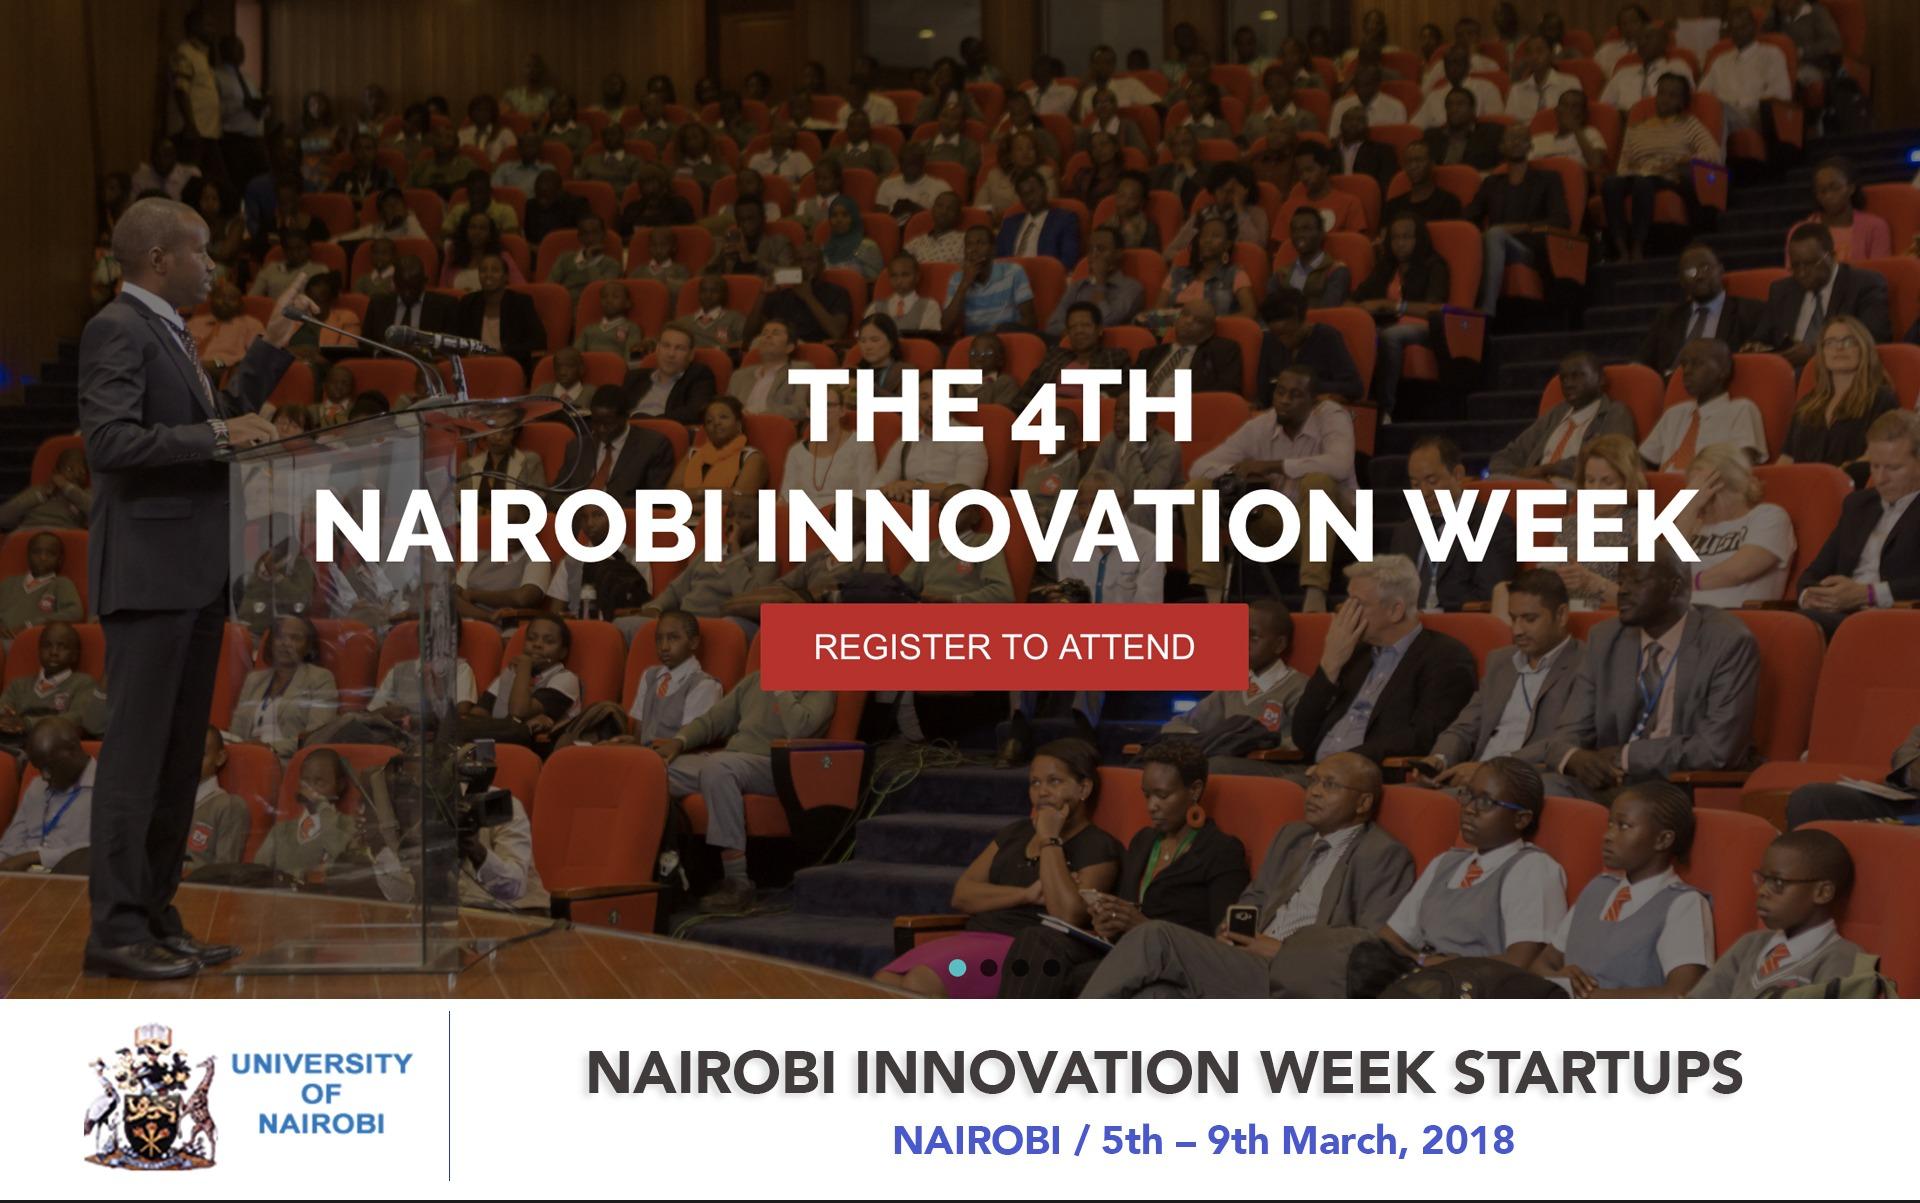 NAIROBI INNOVATION WEEK STARTUPS OPEN FOR STARTUP REGISTRATION - Techgistafrica